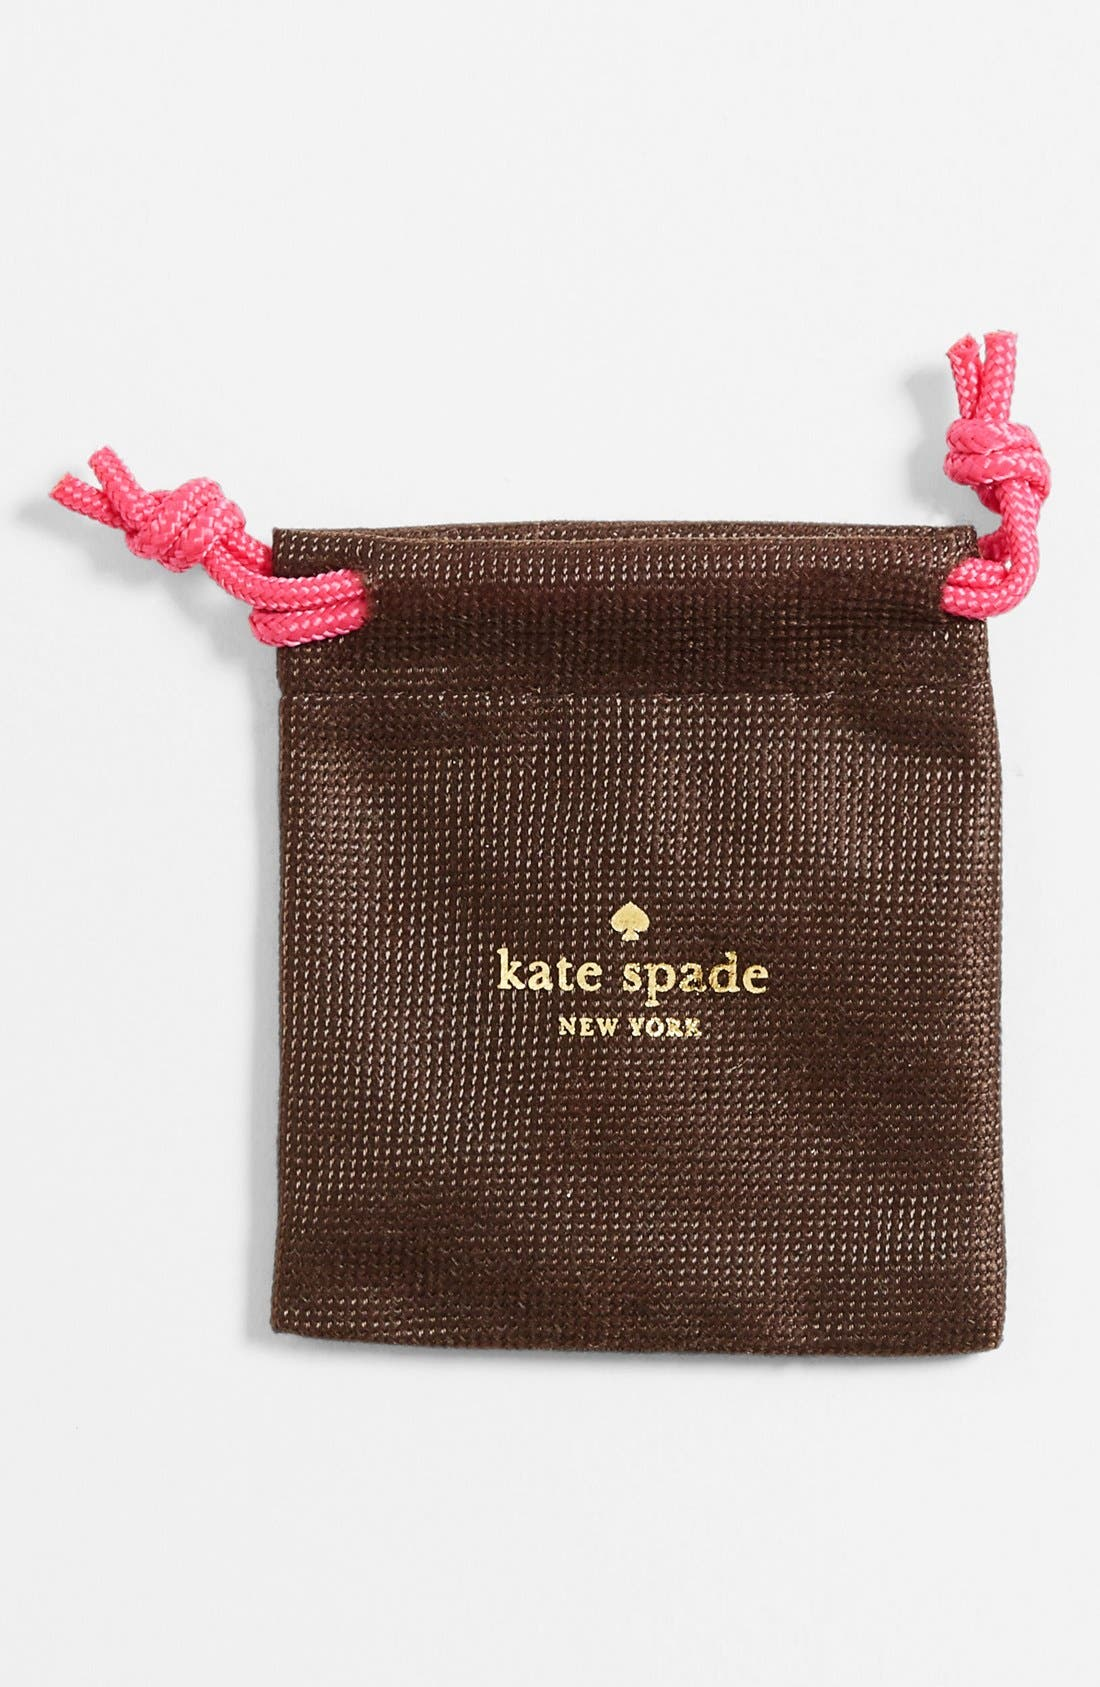 KATE SPADE NEW YORK, 'skinny mini' bow stud earrings, Main thumbnail 1, color, 040